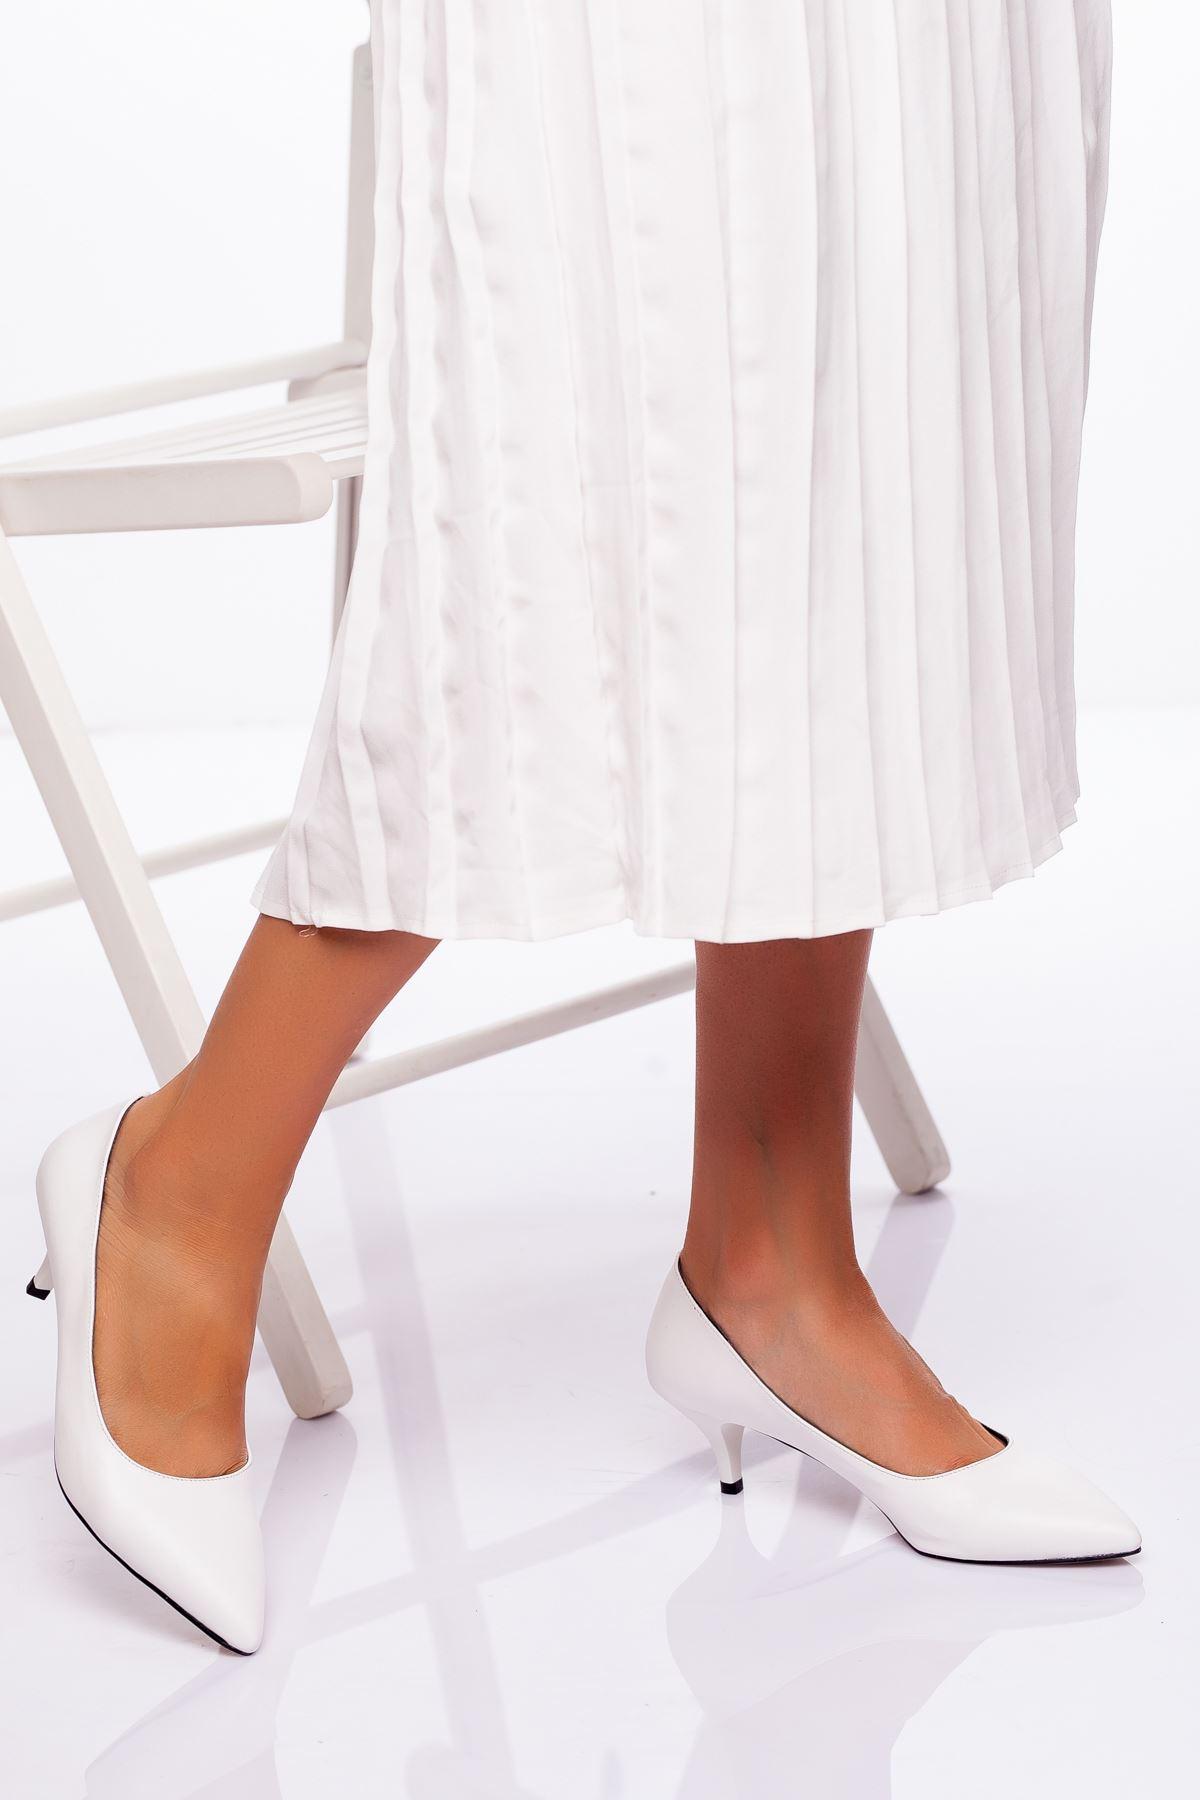 Abella Topuklu Ayakkabı BEYAZ CİLT